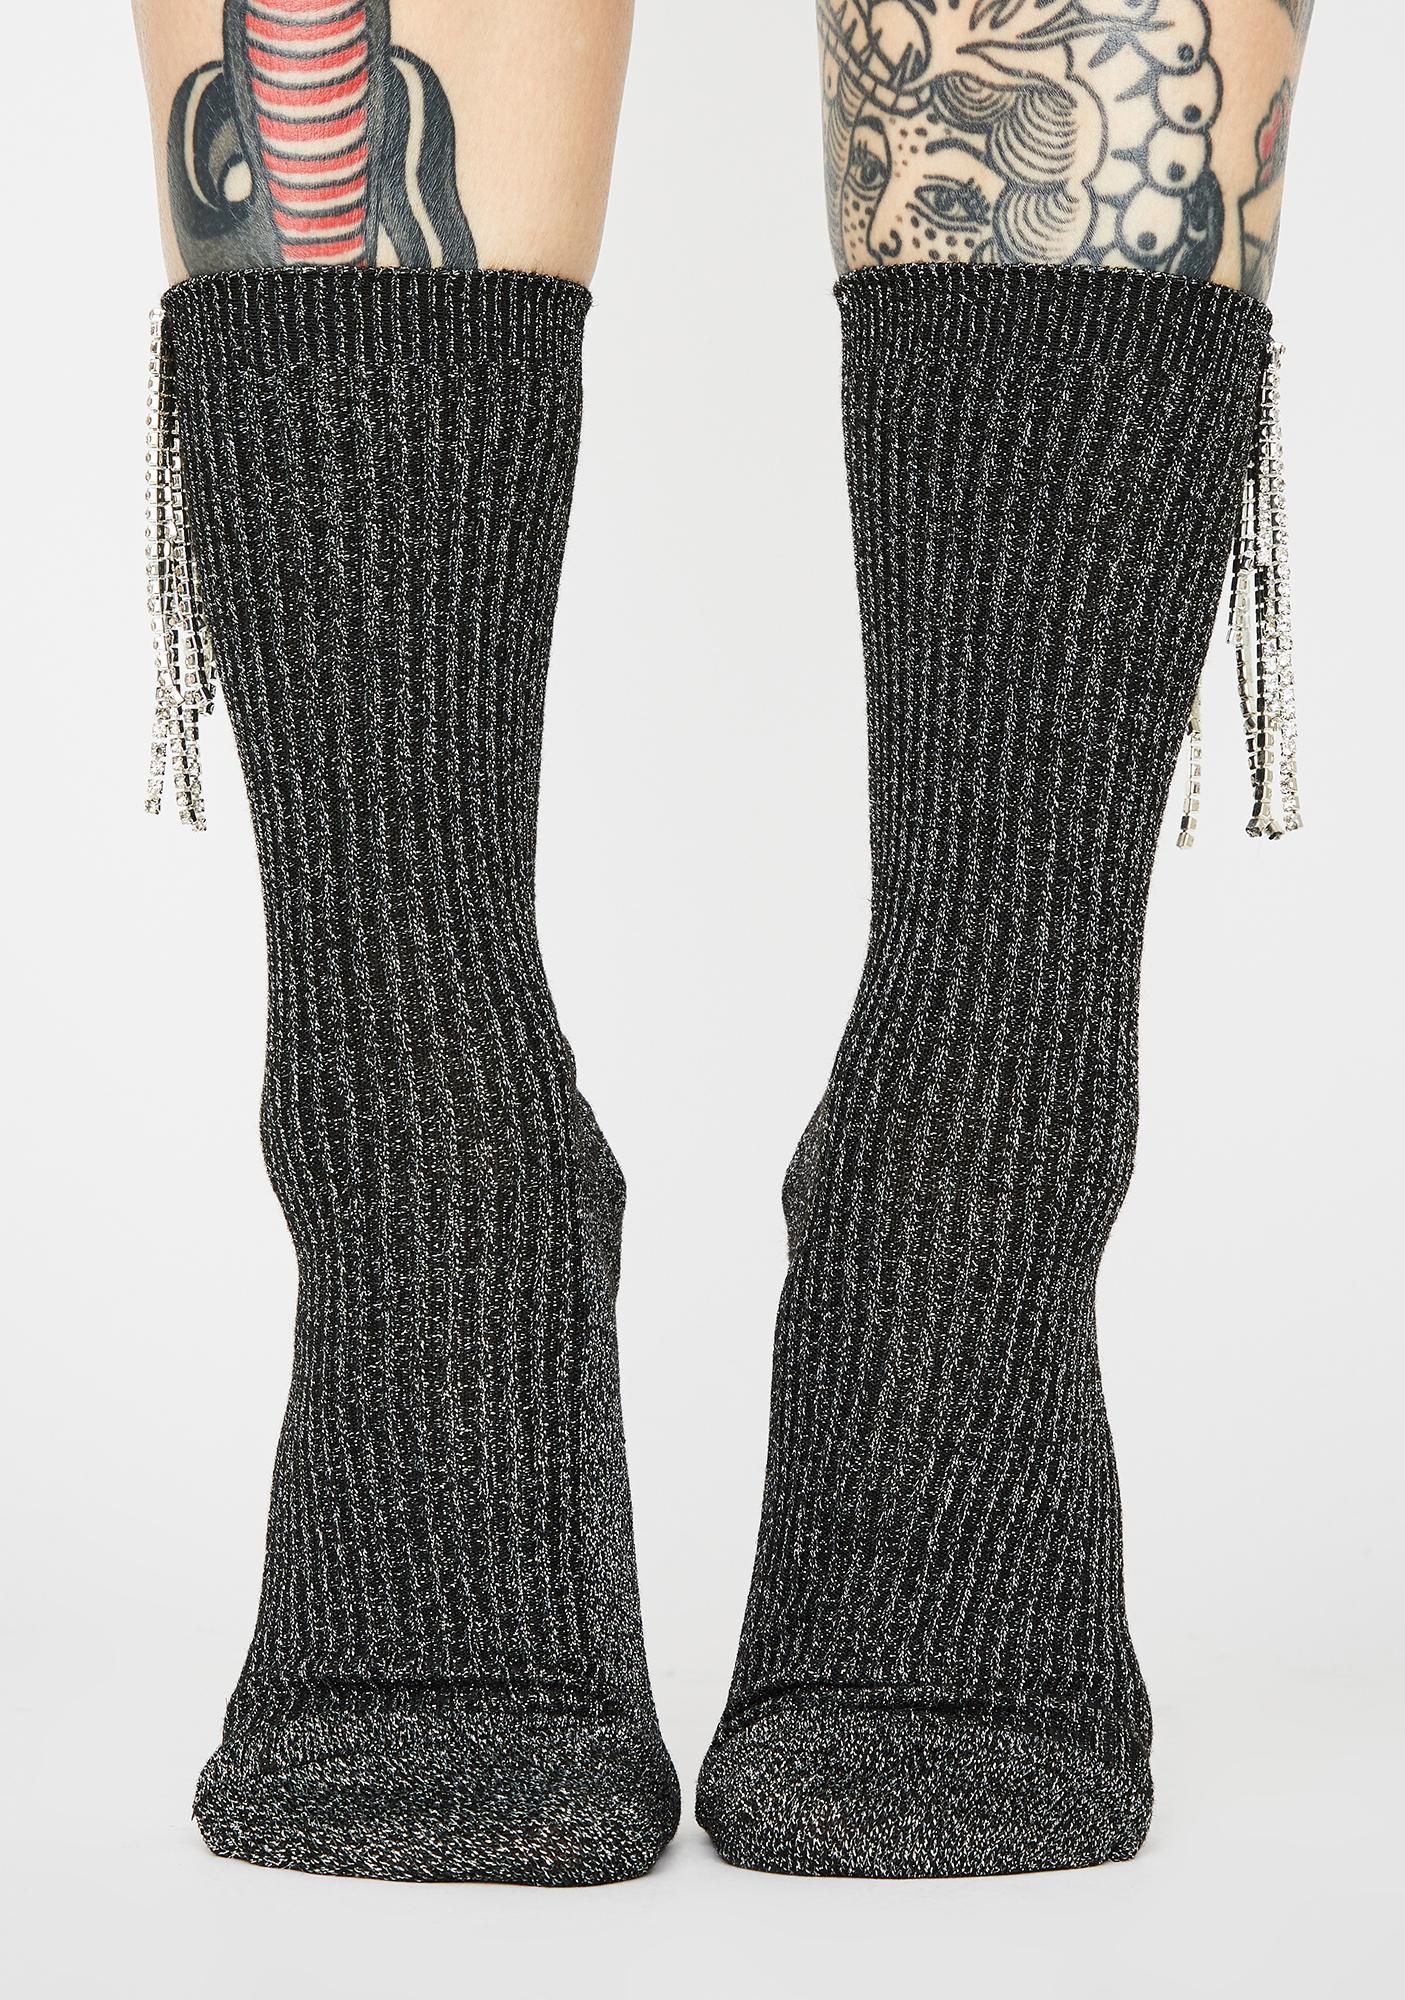 Regal Dazzle Rhinestone Fringe Socks